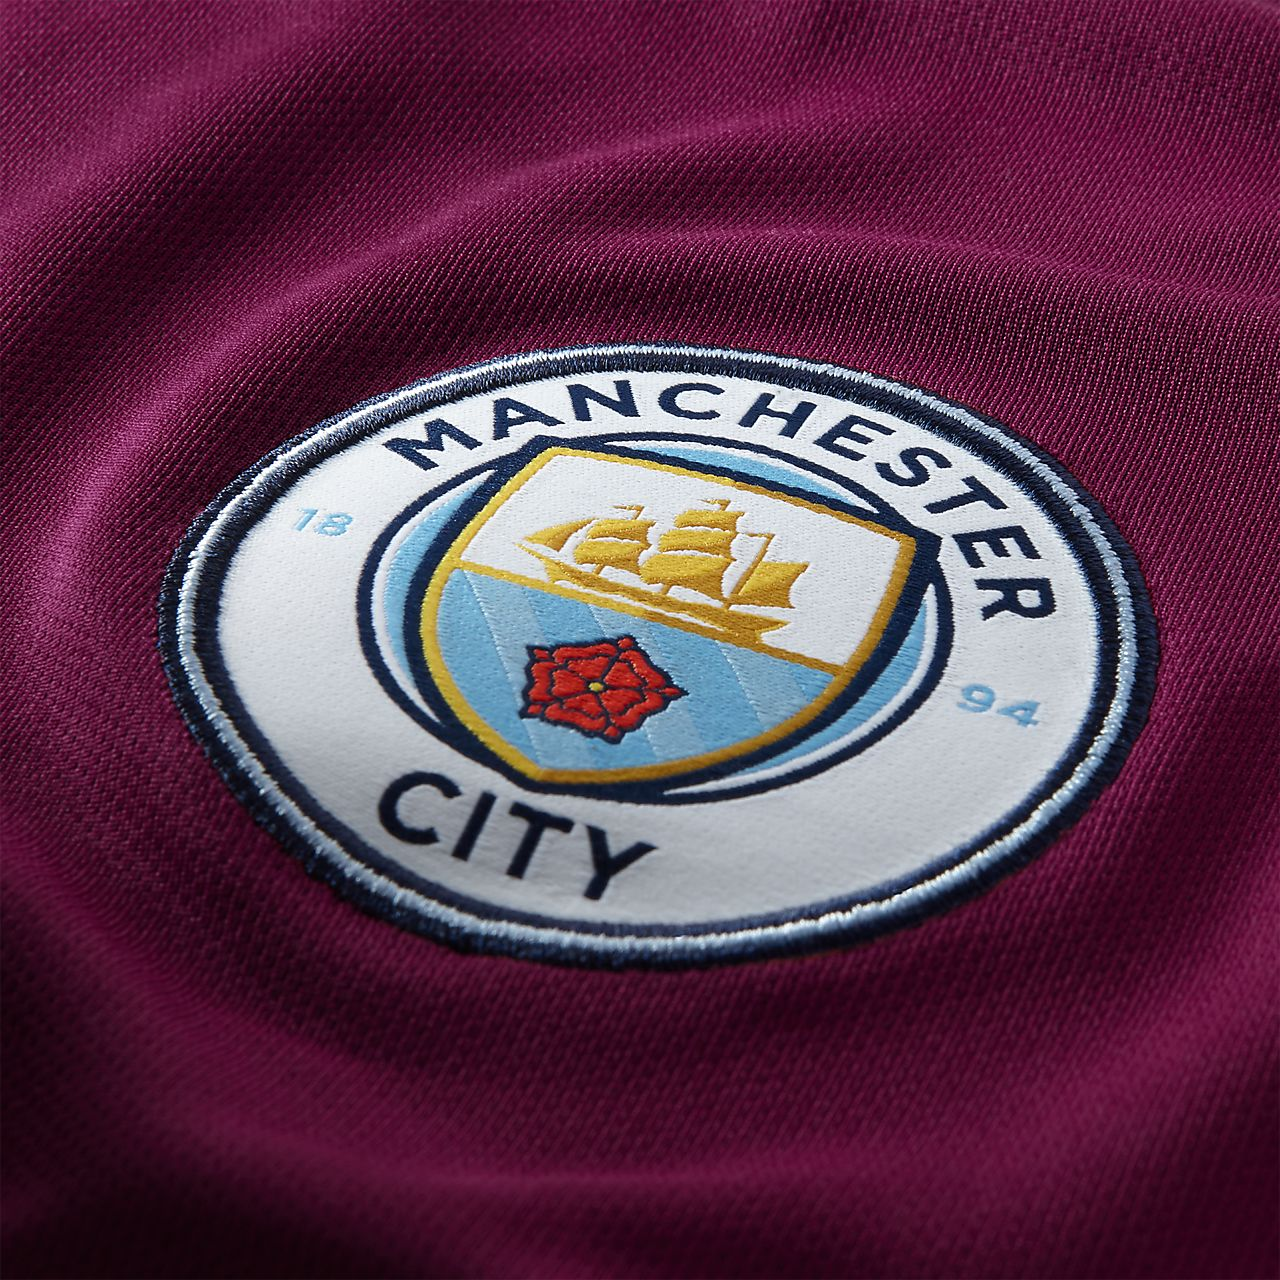 Delapan Manchester City Fc Stadium Away Mens Football Shirt